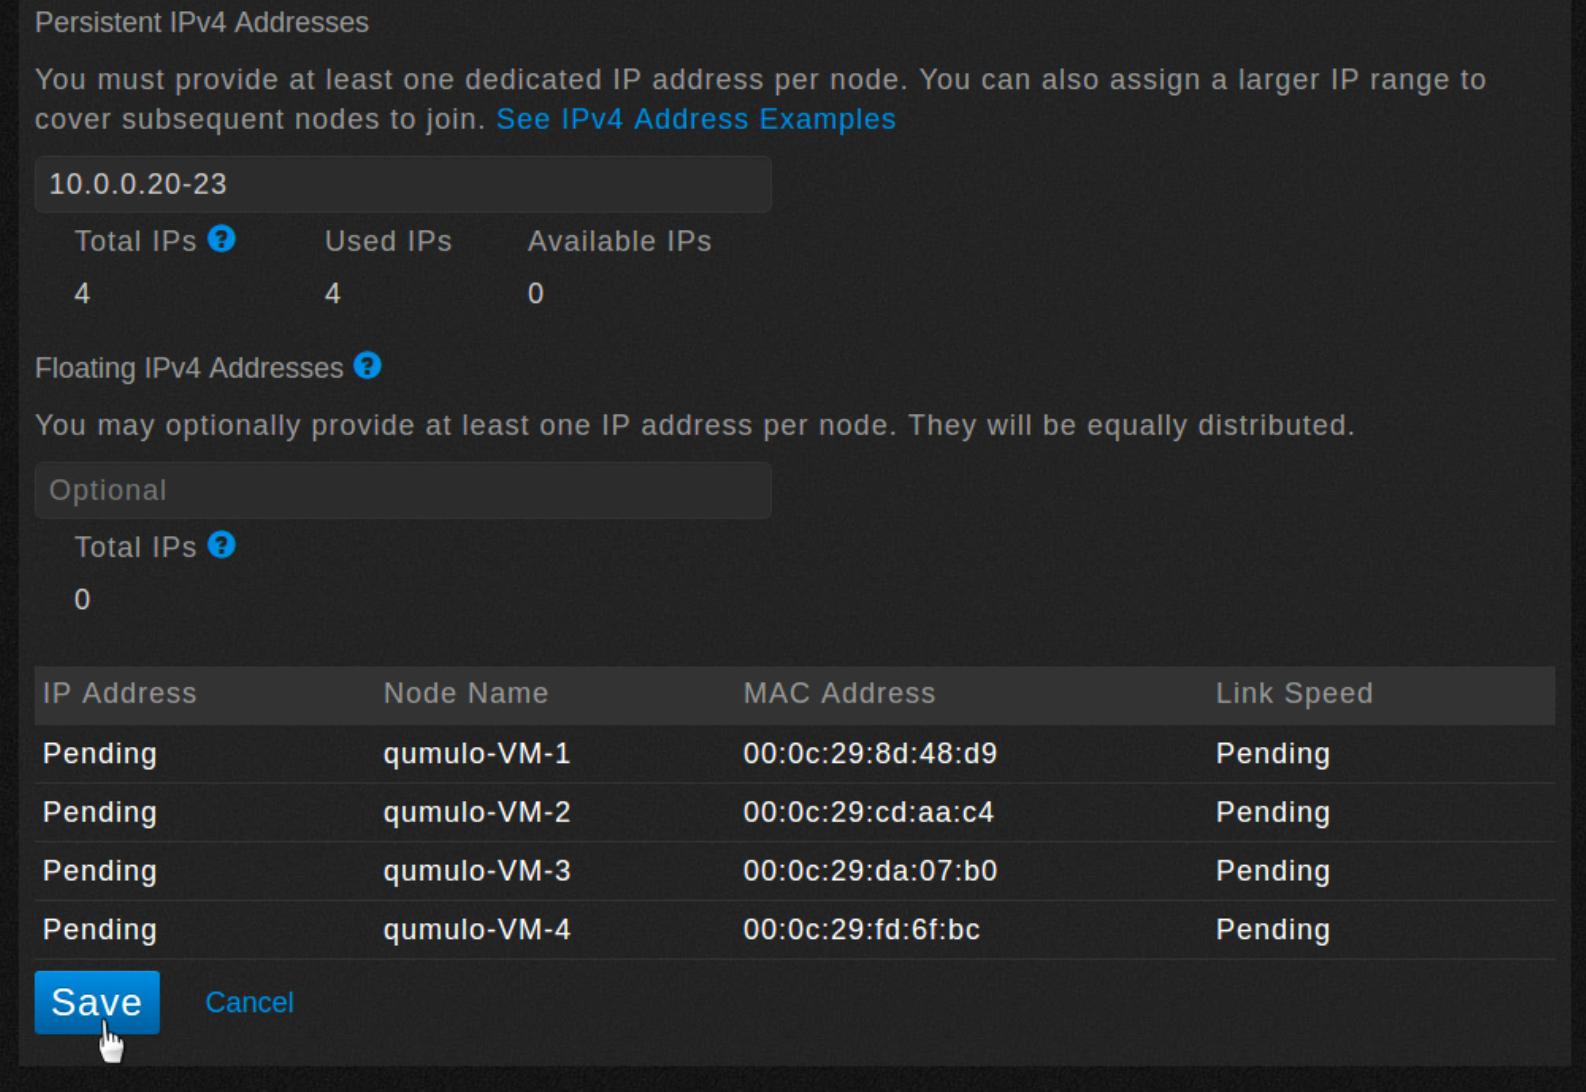 Network configuration -- set floating IP addresses